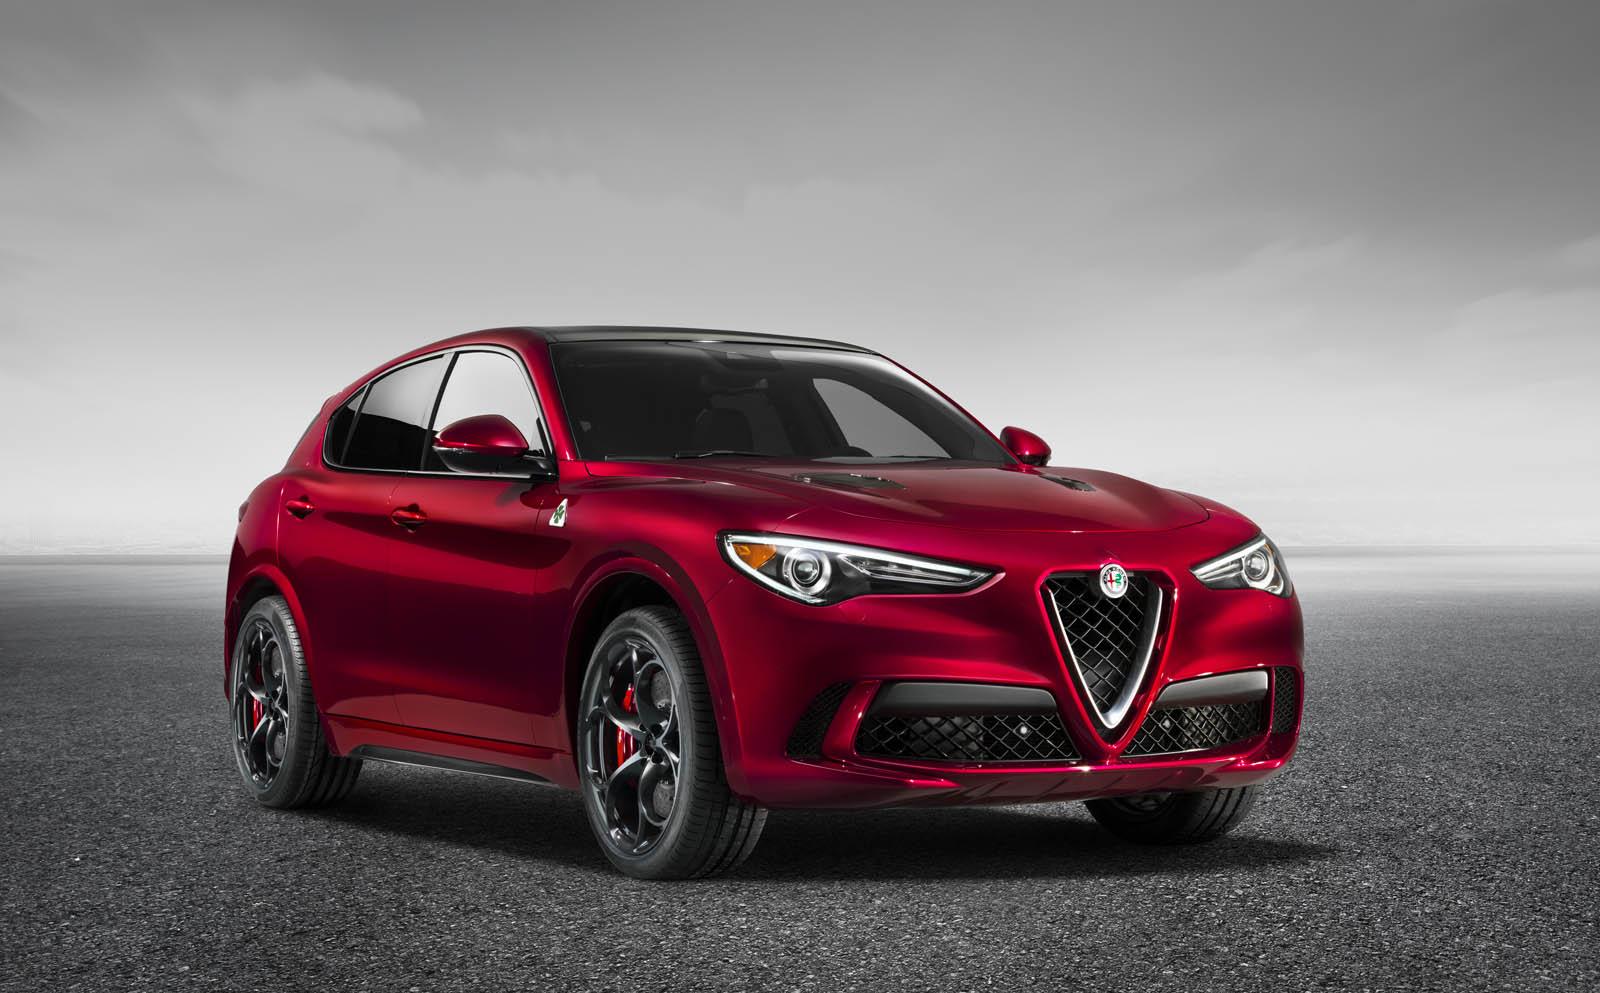 Alfa Romeo Stelvio Quadrifoglio Goes On Sale